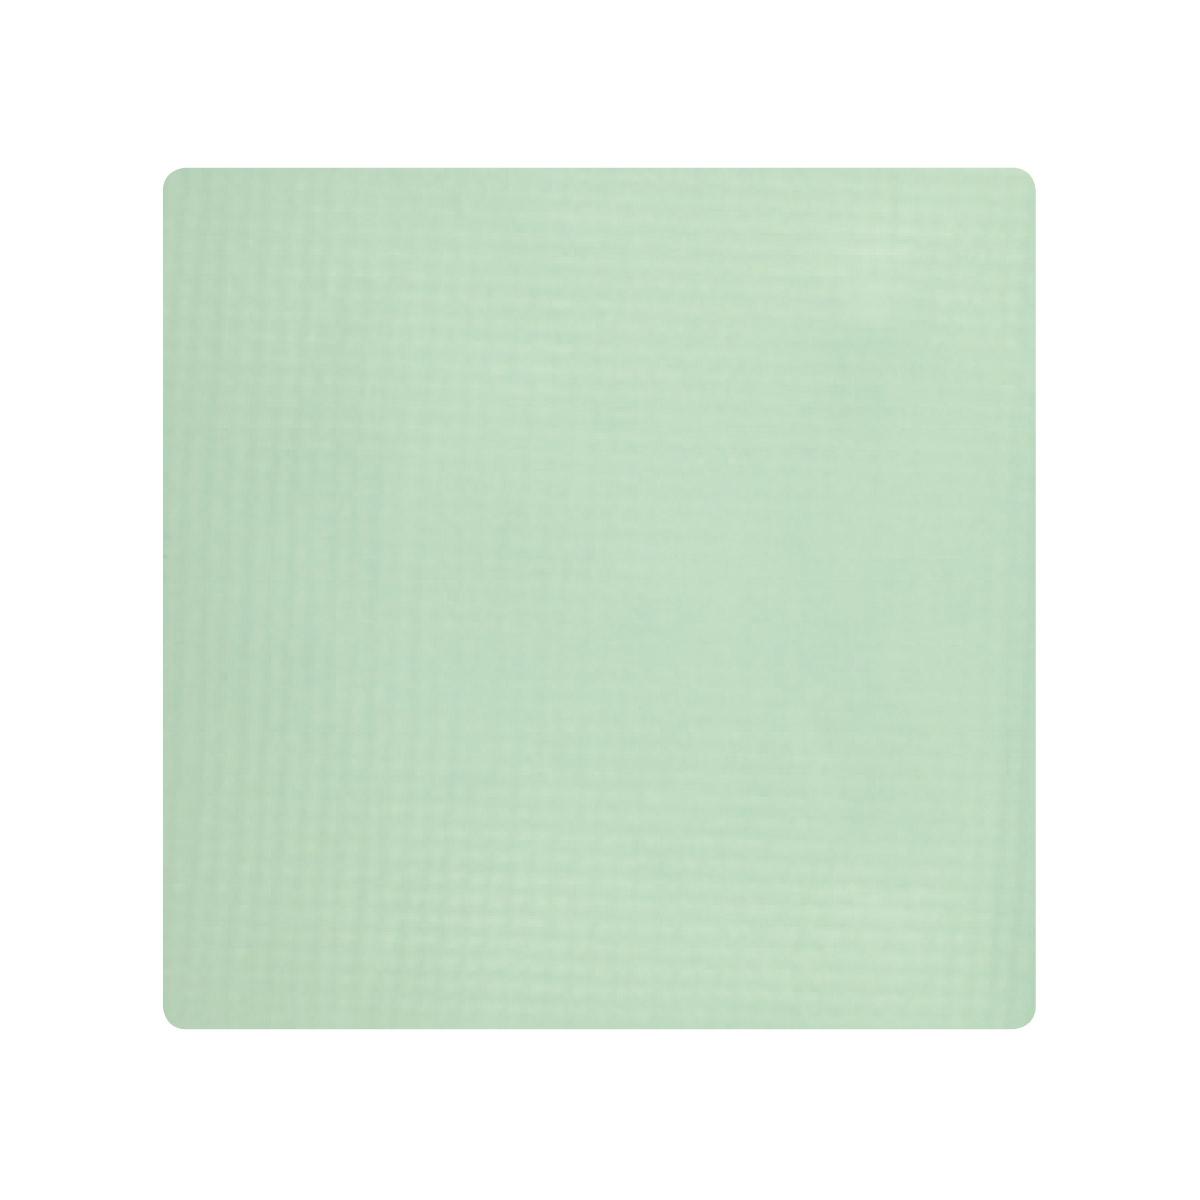 Schwimmbadfolie deluxe rutschfest gewebeverstärkt PVC, karibikgrün 1,5 x 165 cm l=20m Rolle Schwimmbadfolie deluxe rutschfest gewebeverstärkt PVC, karibikgrün 1,5 x 165 cm l=20m Rolle